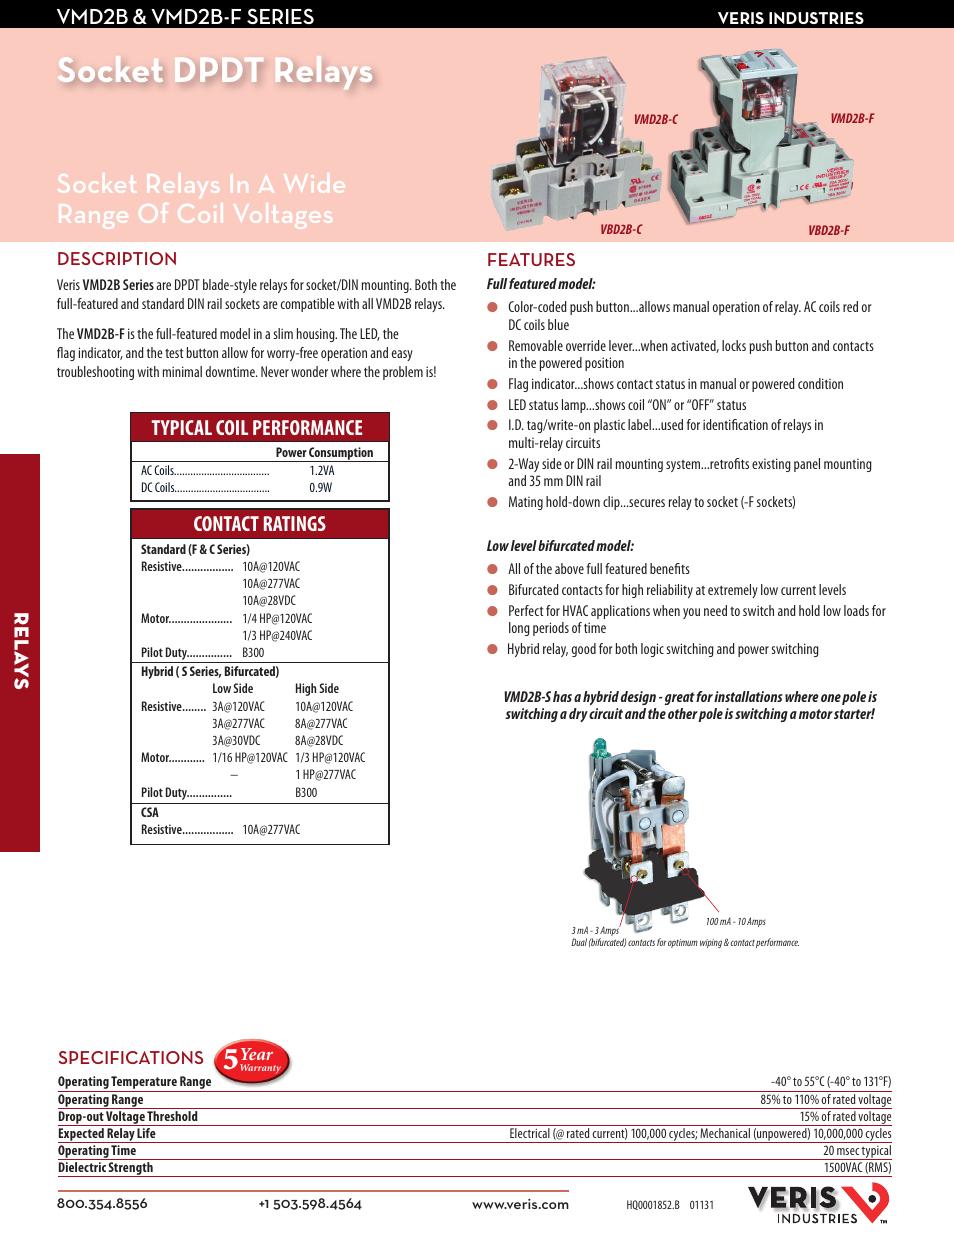 Veris Industries VMD2B-F SERIES Datasheet User Manual | 2 pages